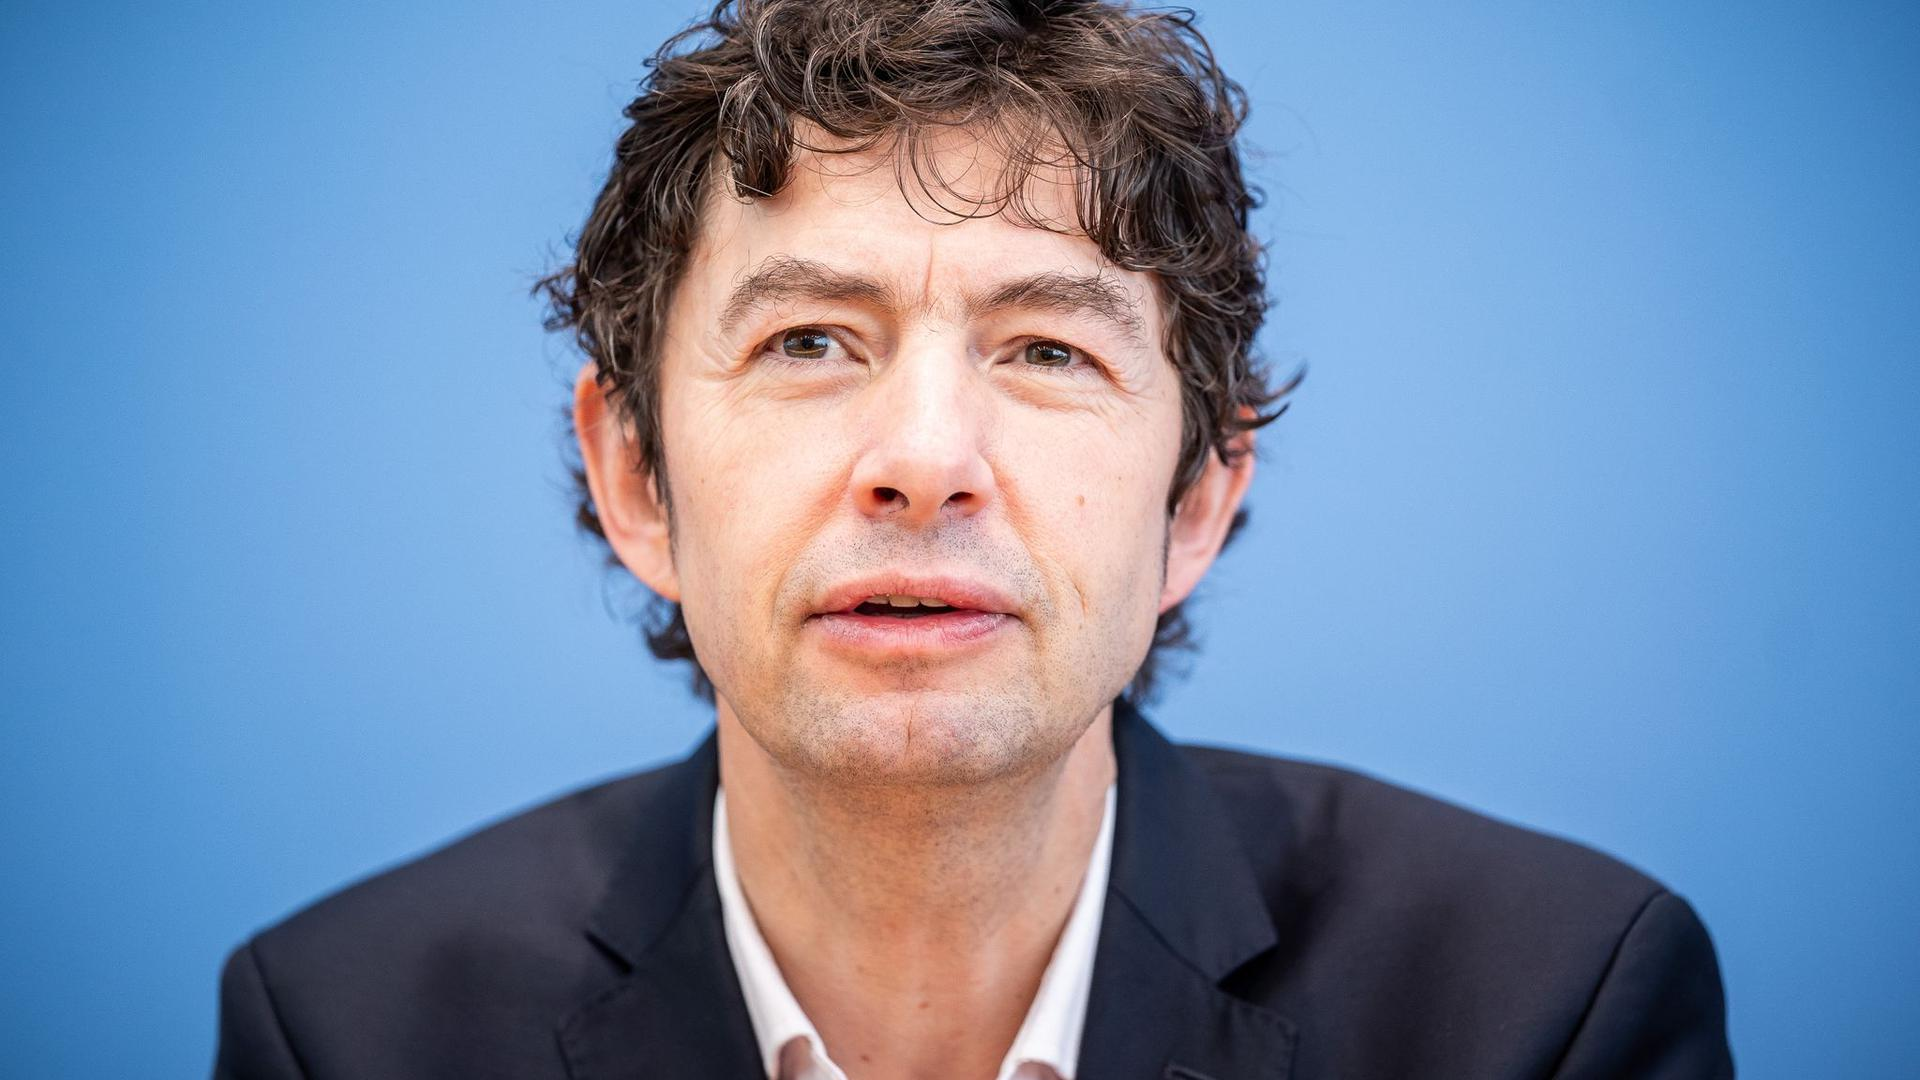 Prof. Dr. Christian Drosten, Direktor Institut für Virologie, Charité Berlin.